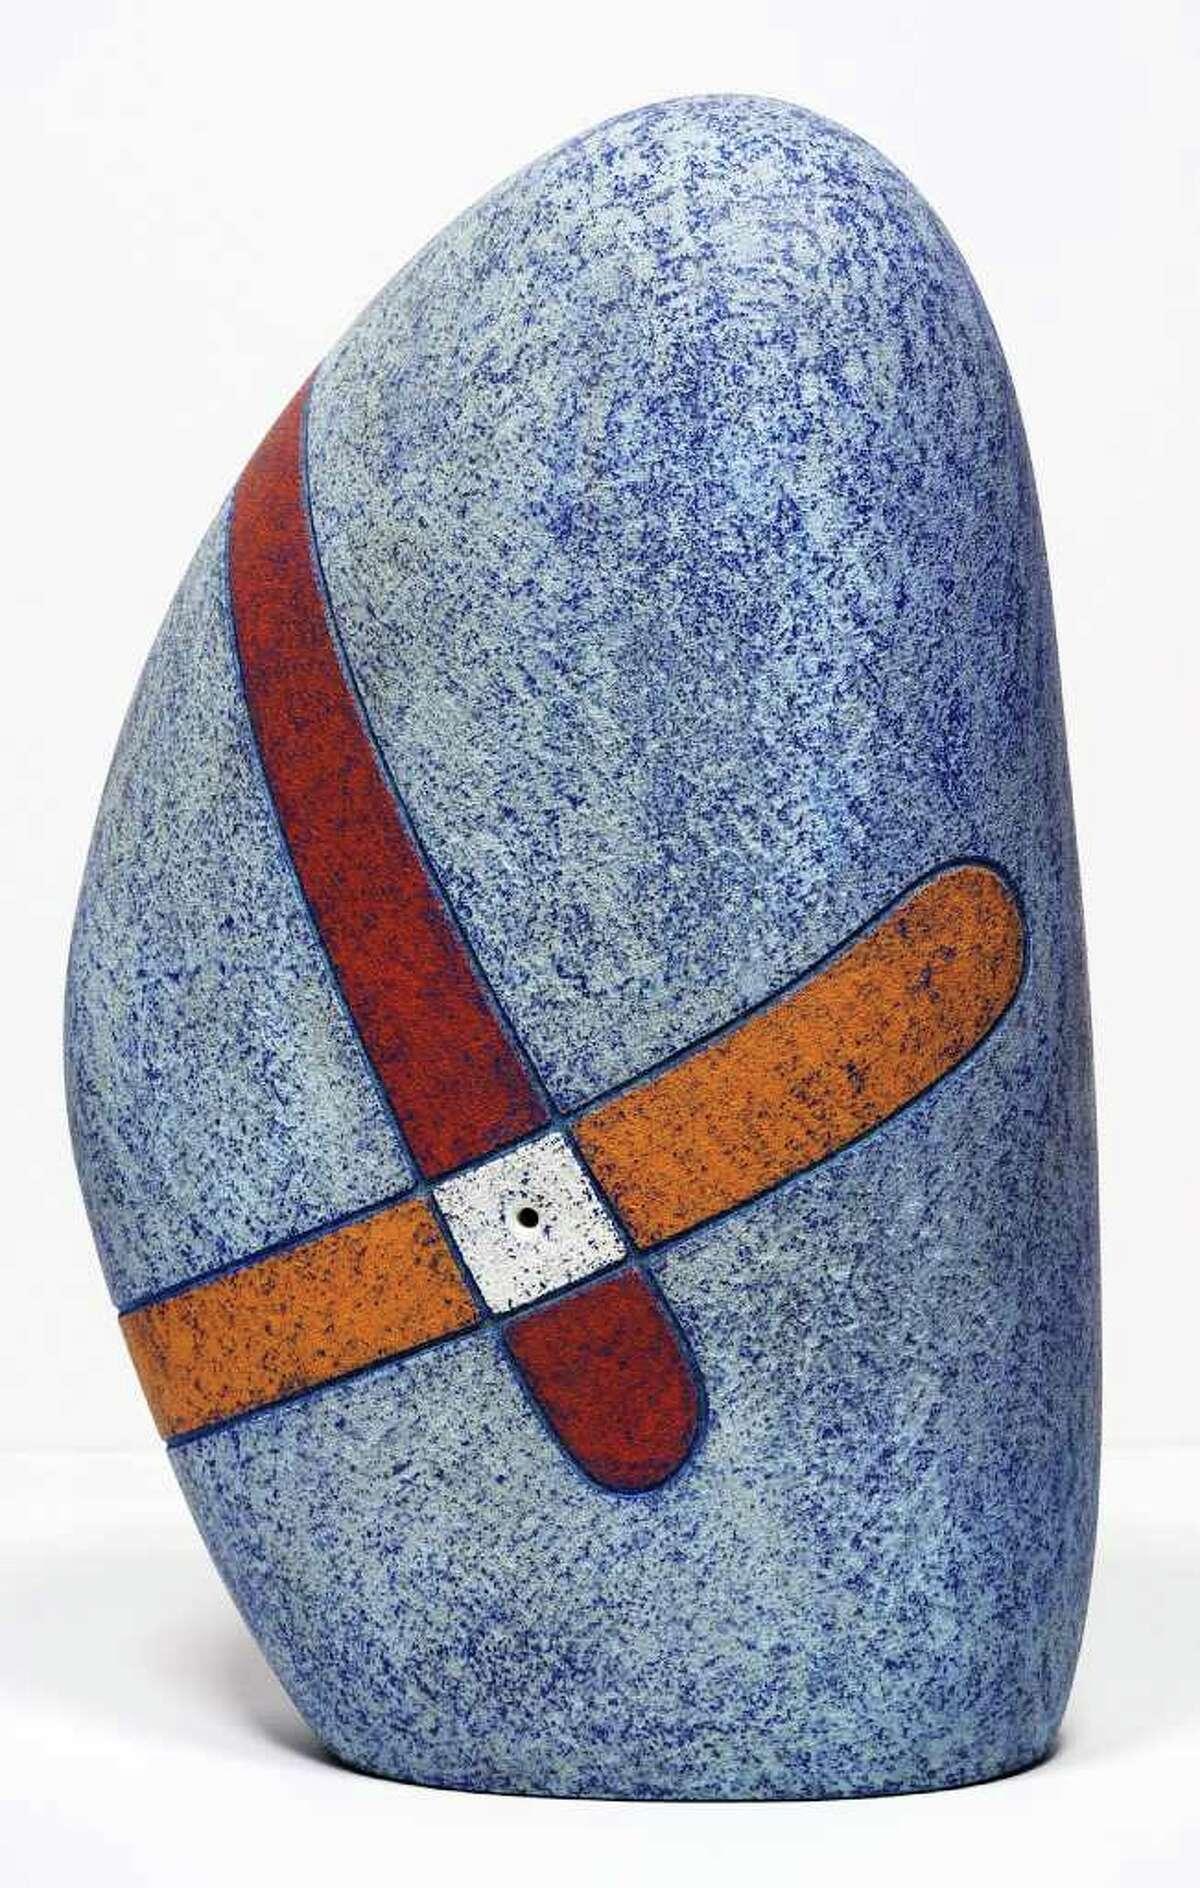 Danville Chadbourne's ceramic